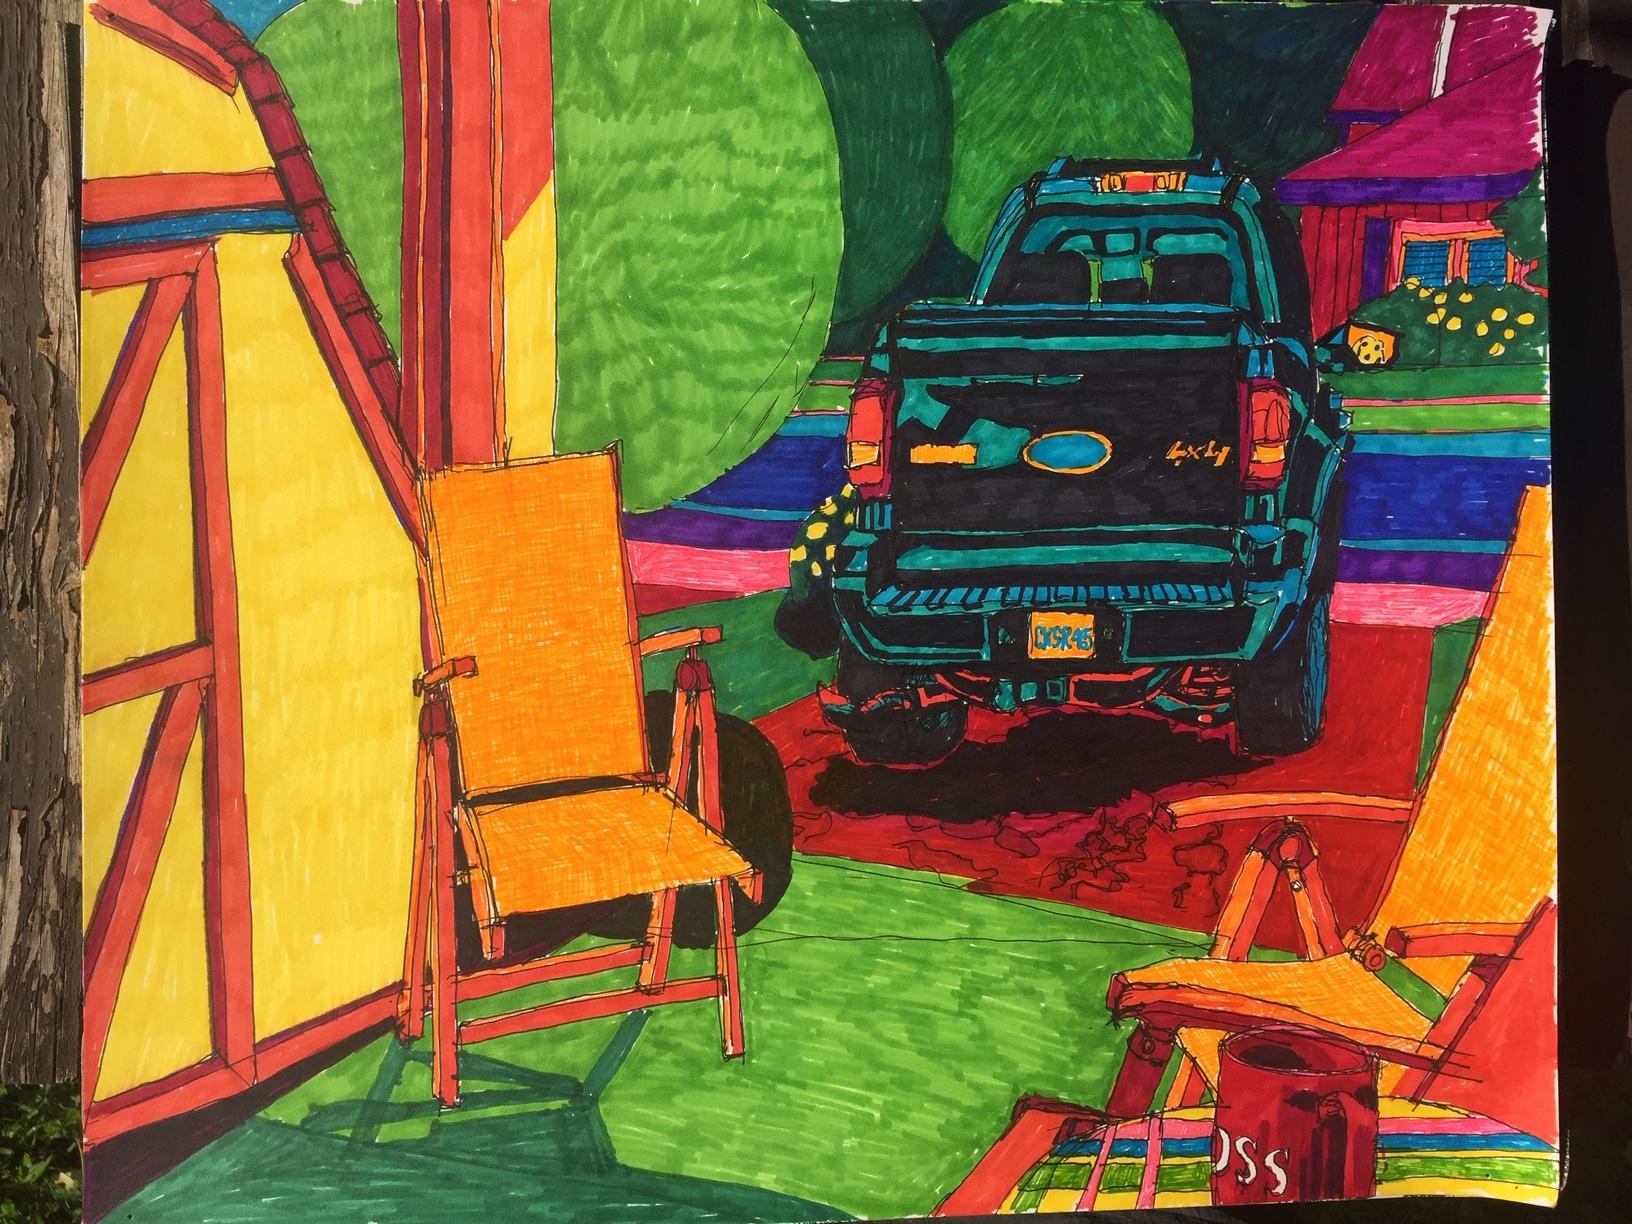 cksr-465---2235-manchester-drive-by-cork-ireland-freelance-artist---art-van-leeuwen